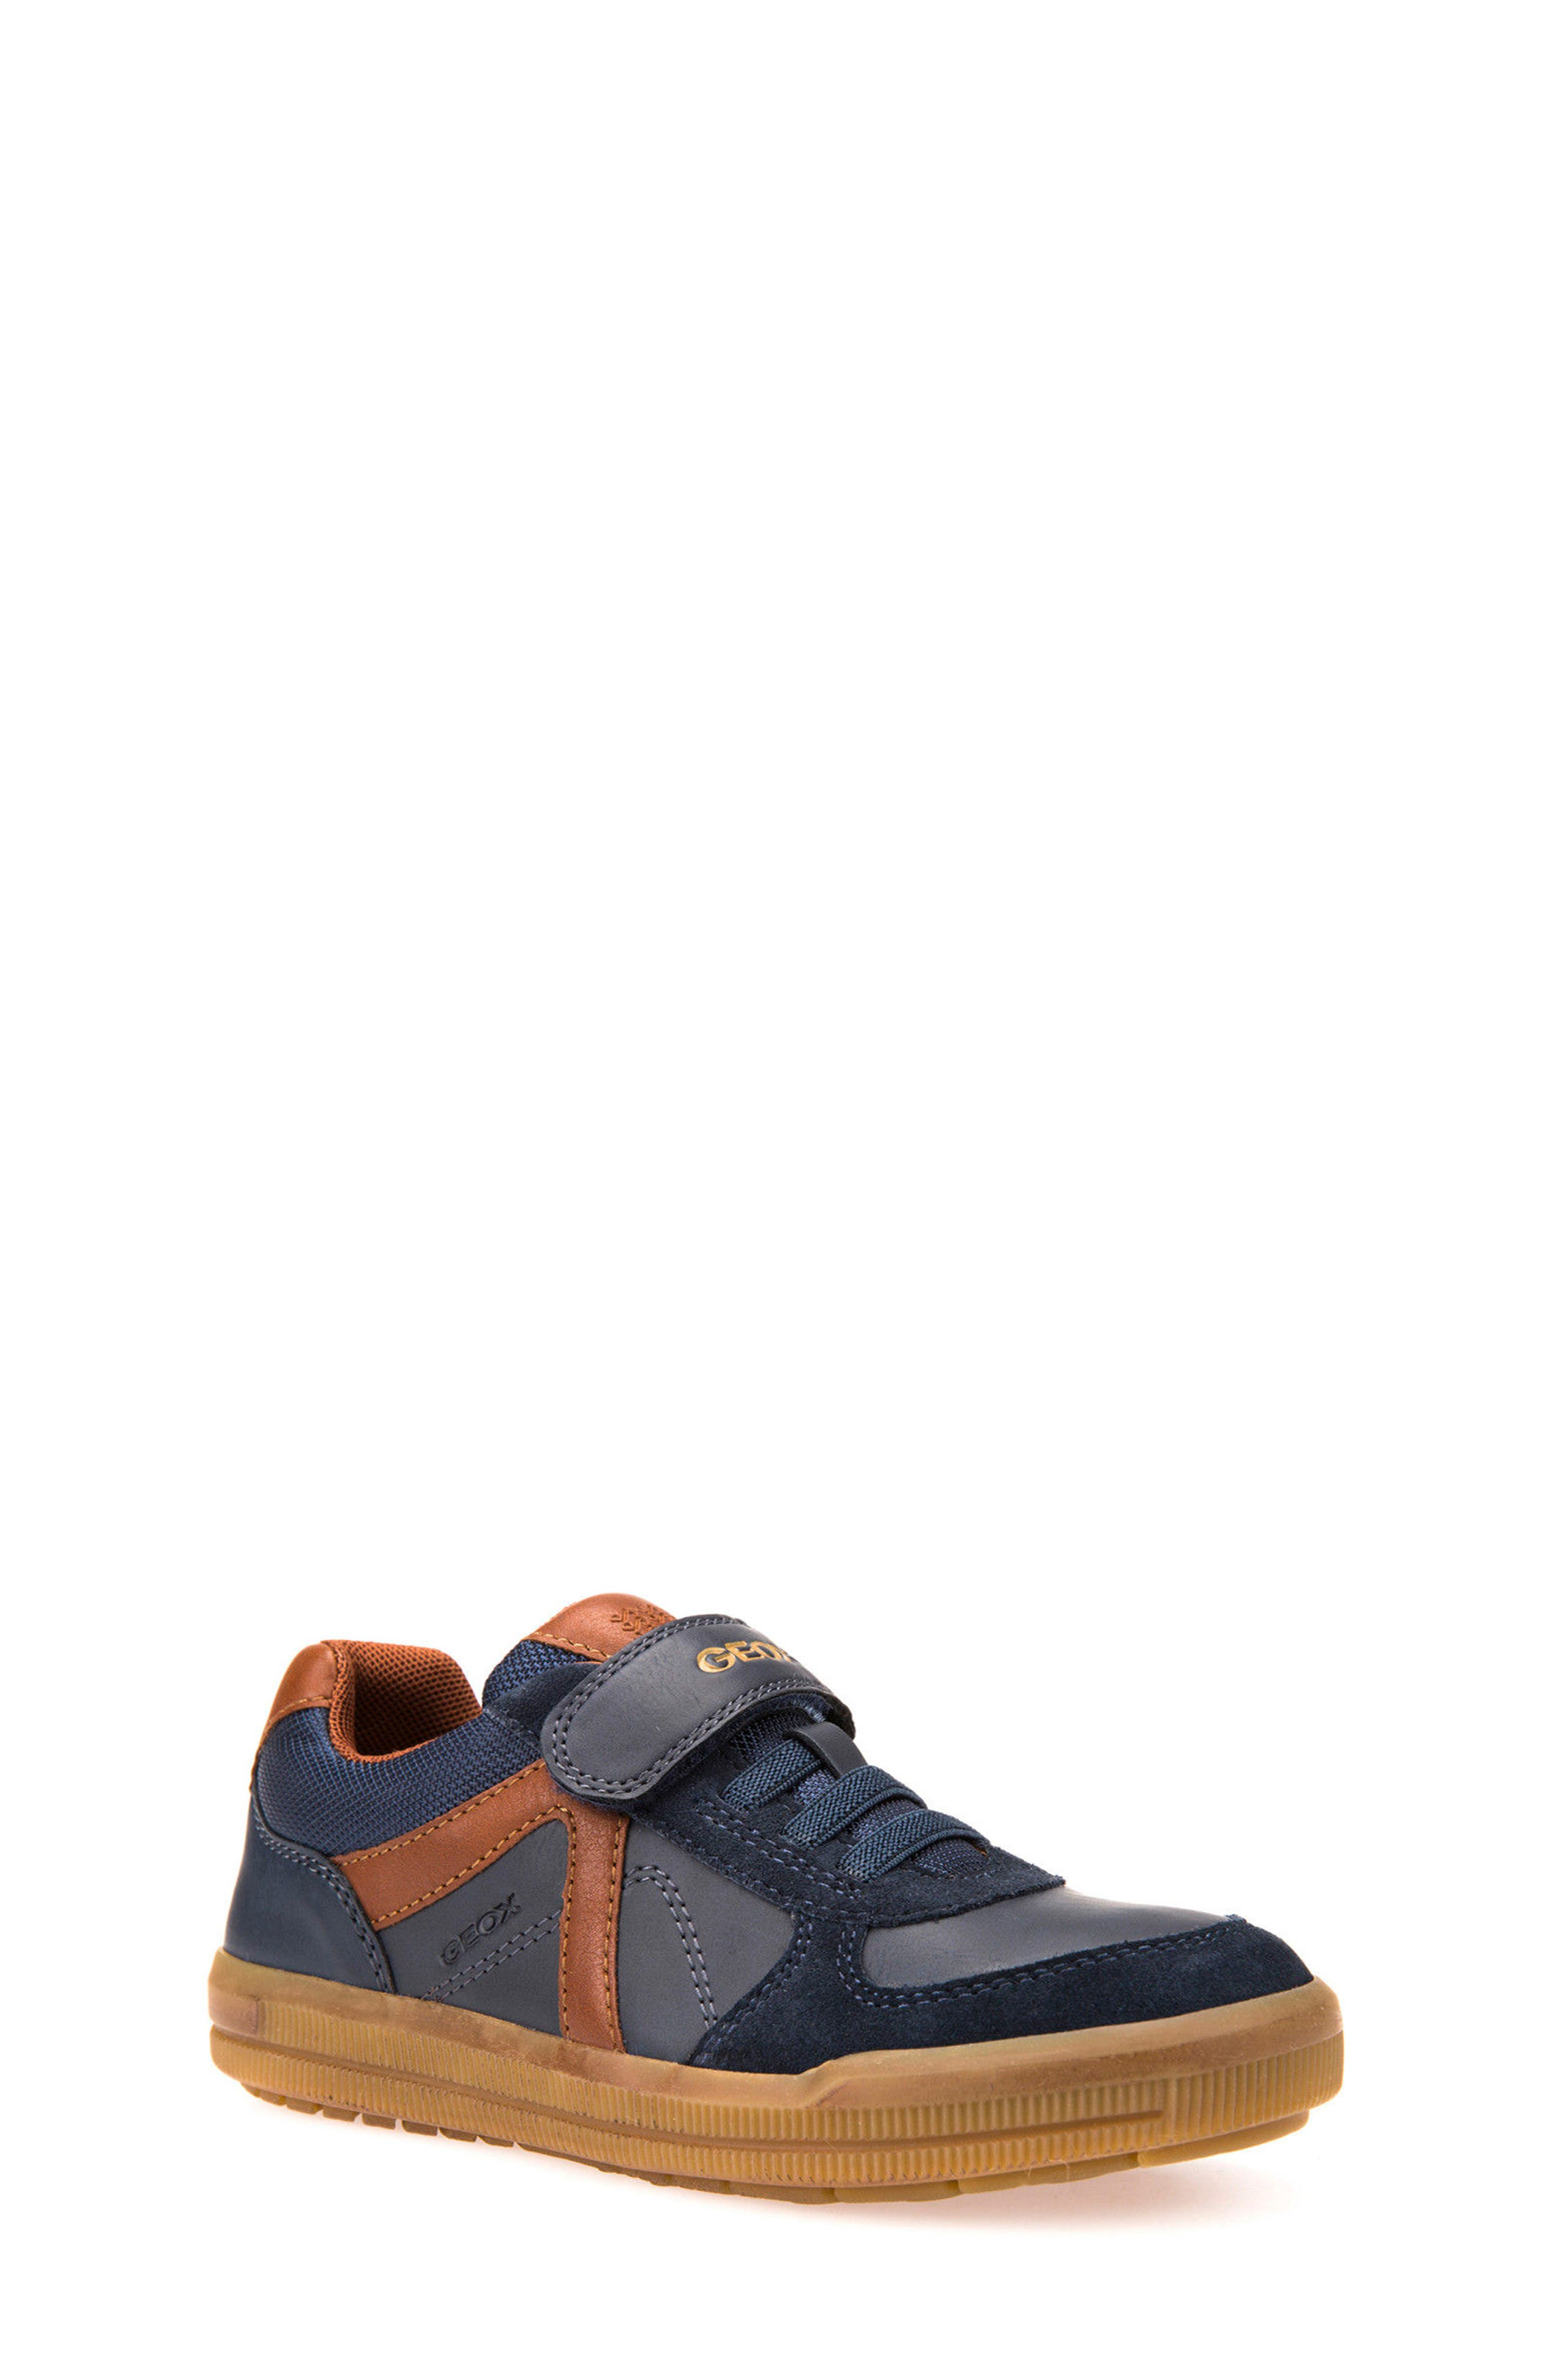 Alternate Image 1 Selected - Geox Arzach Low Top Sneaker (Toddler, Little Kid & Big Kid)